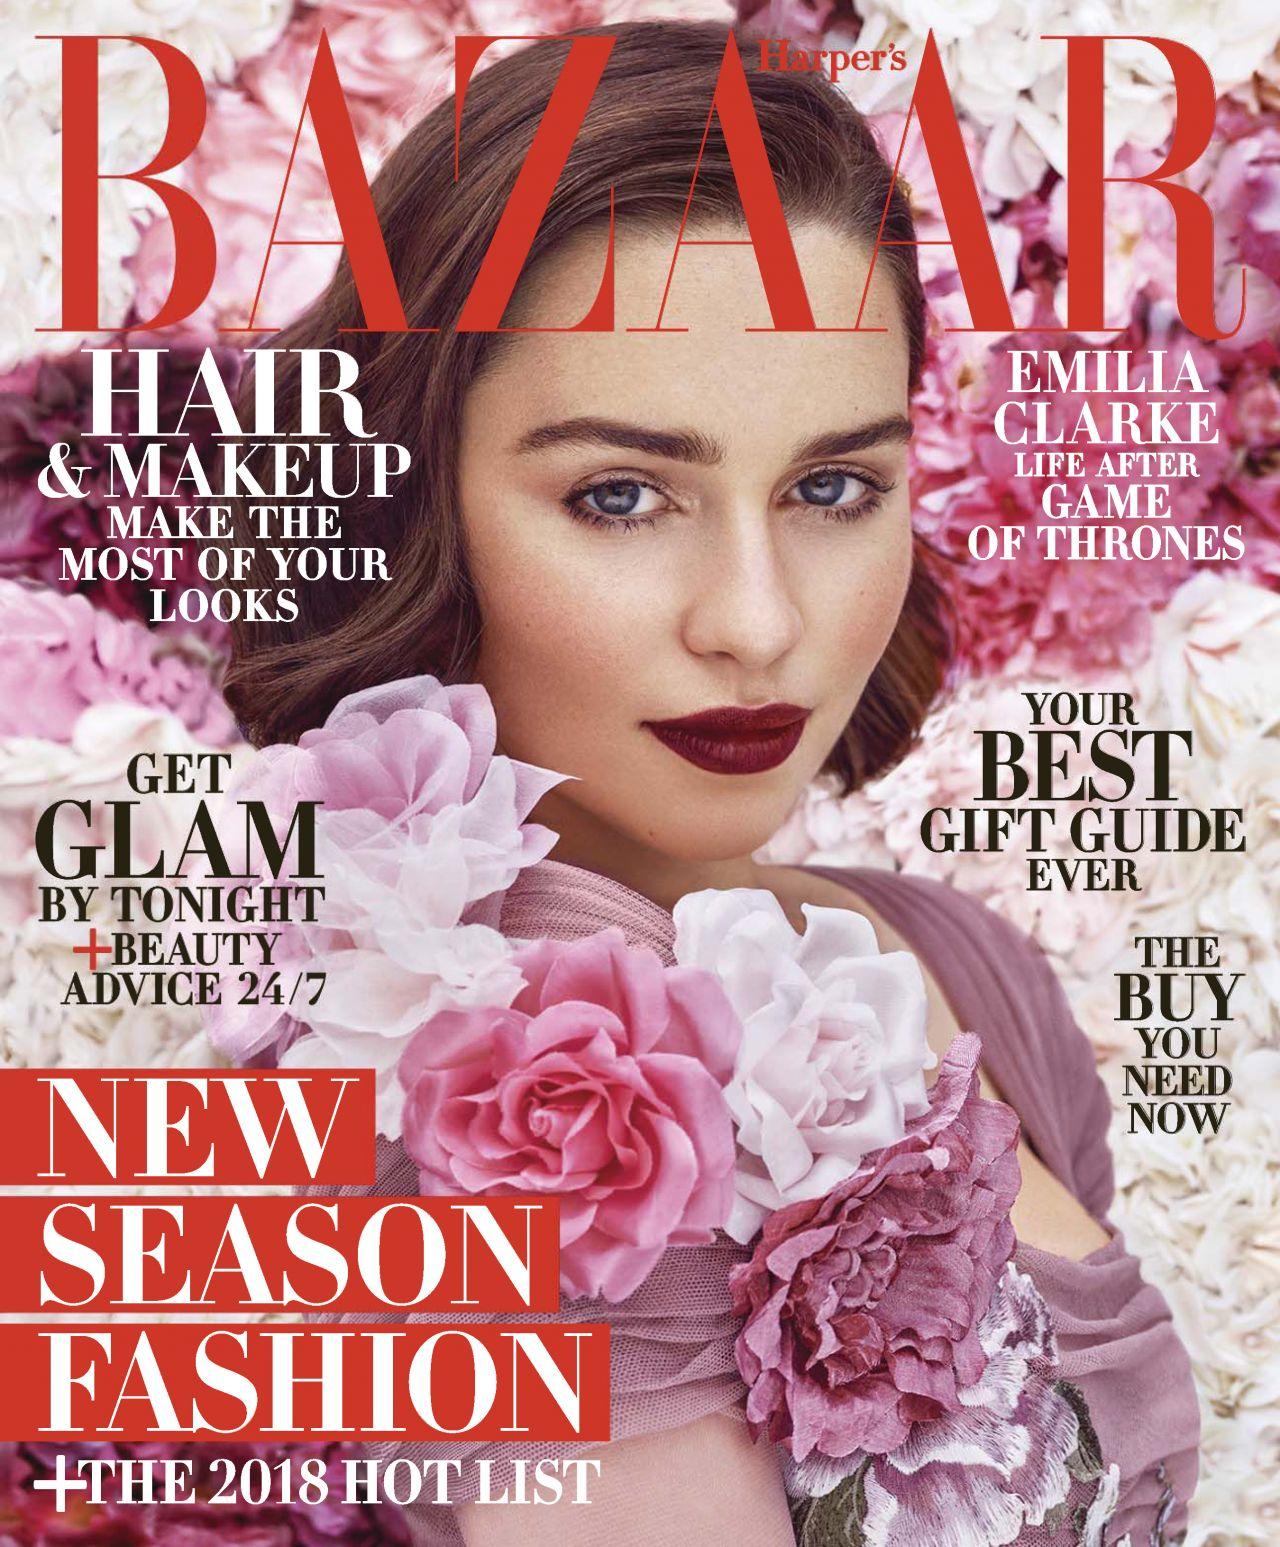 http://celebmafia.com/wp-content/uploads/2017/11/emilia-clarke-harper-s-bazaar-magazine-us-december-2017-january-2018-9.jpg